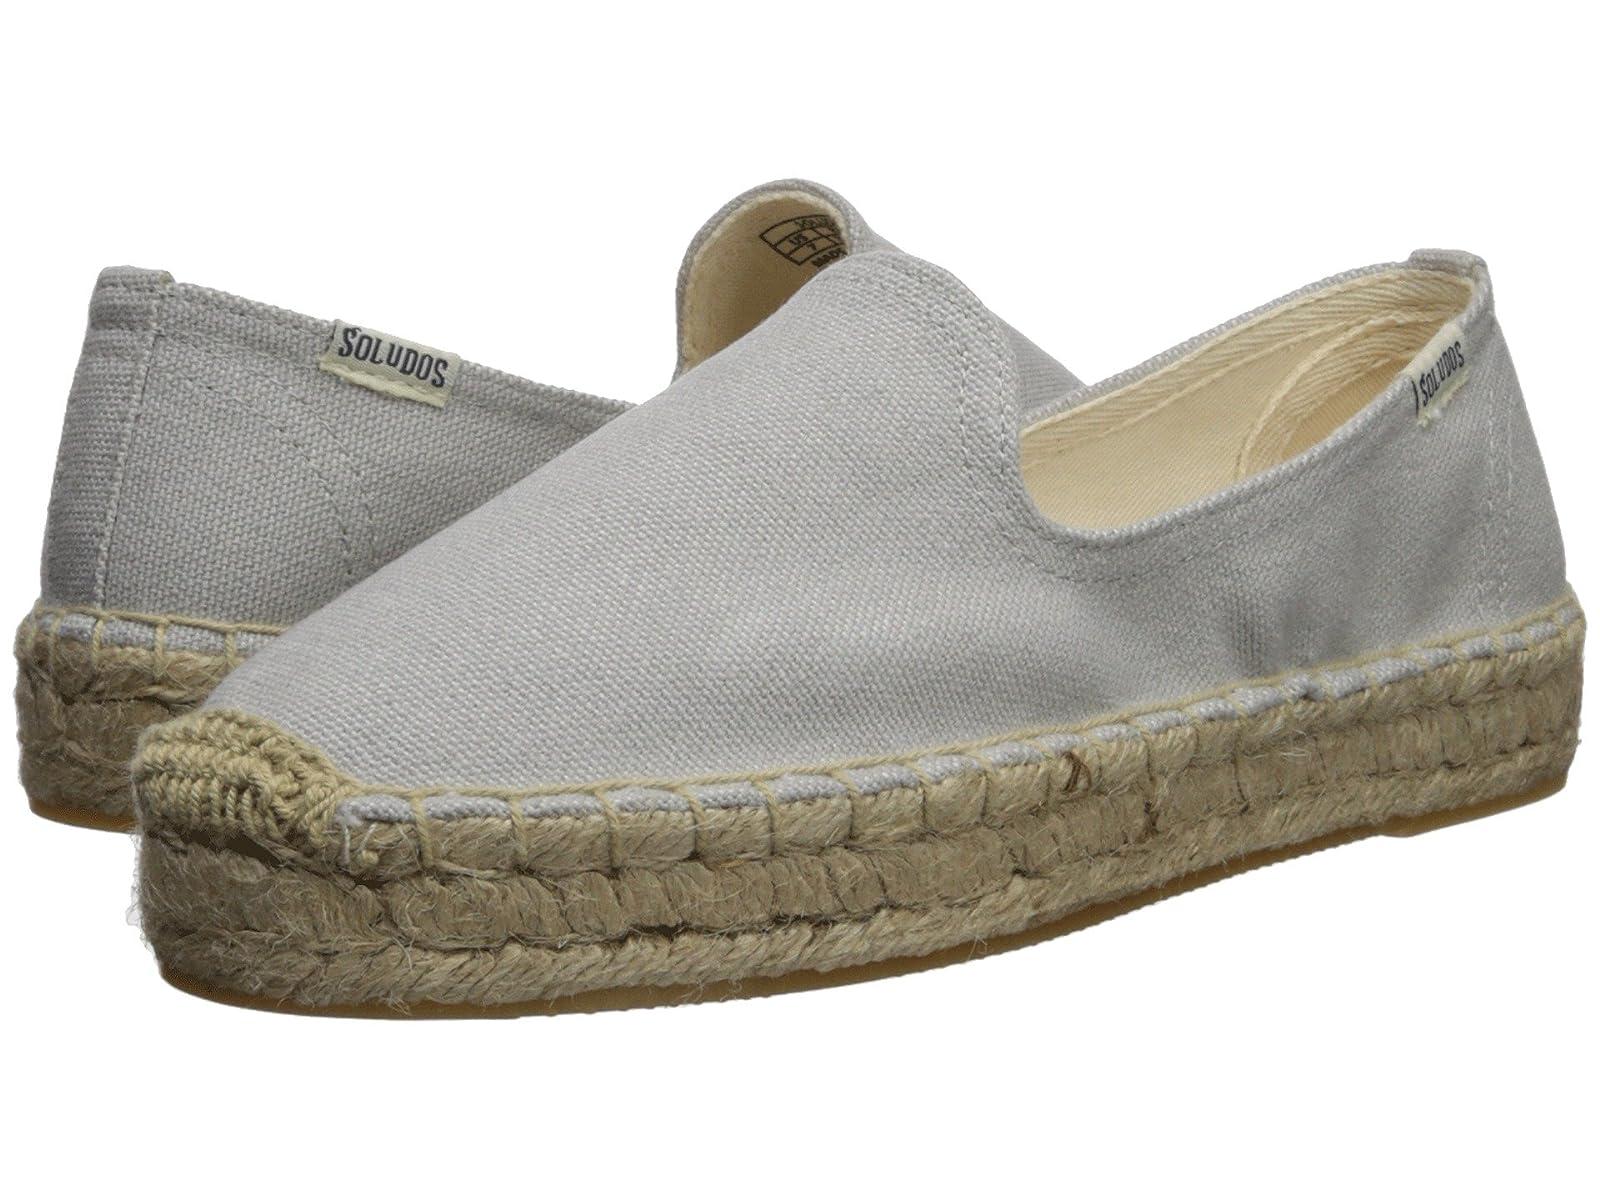 Soludos Platform Smoking SlipperAtmospheric grades have affordable shoes